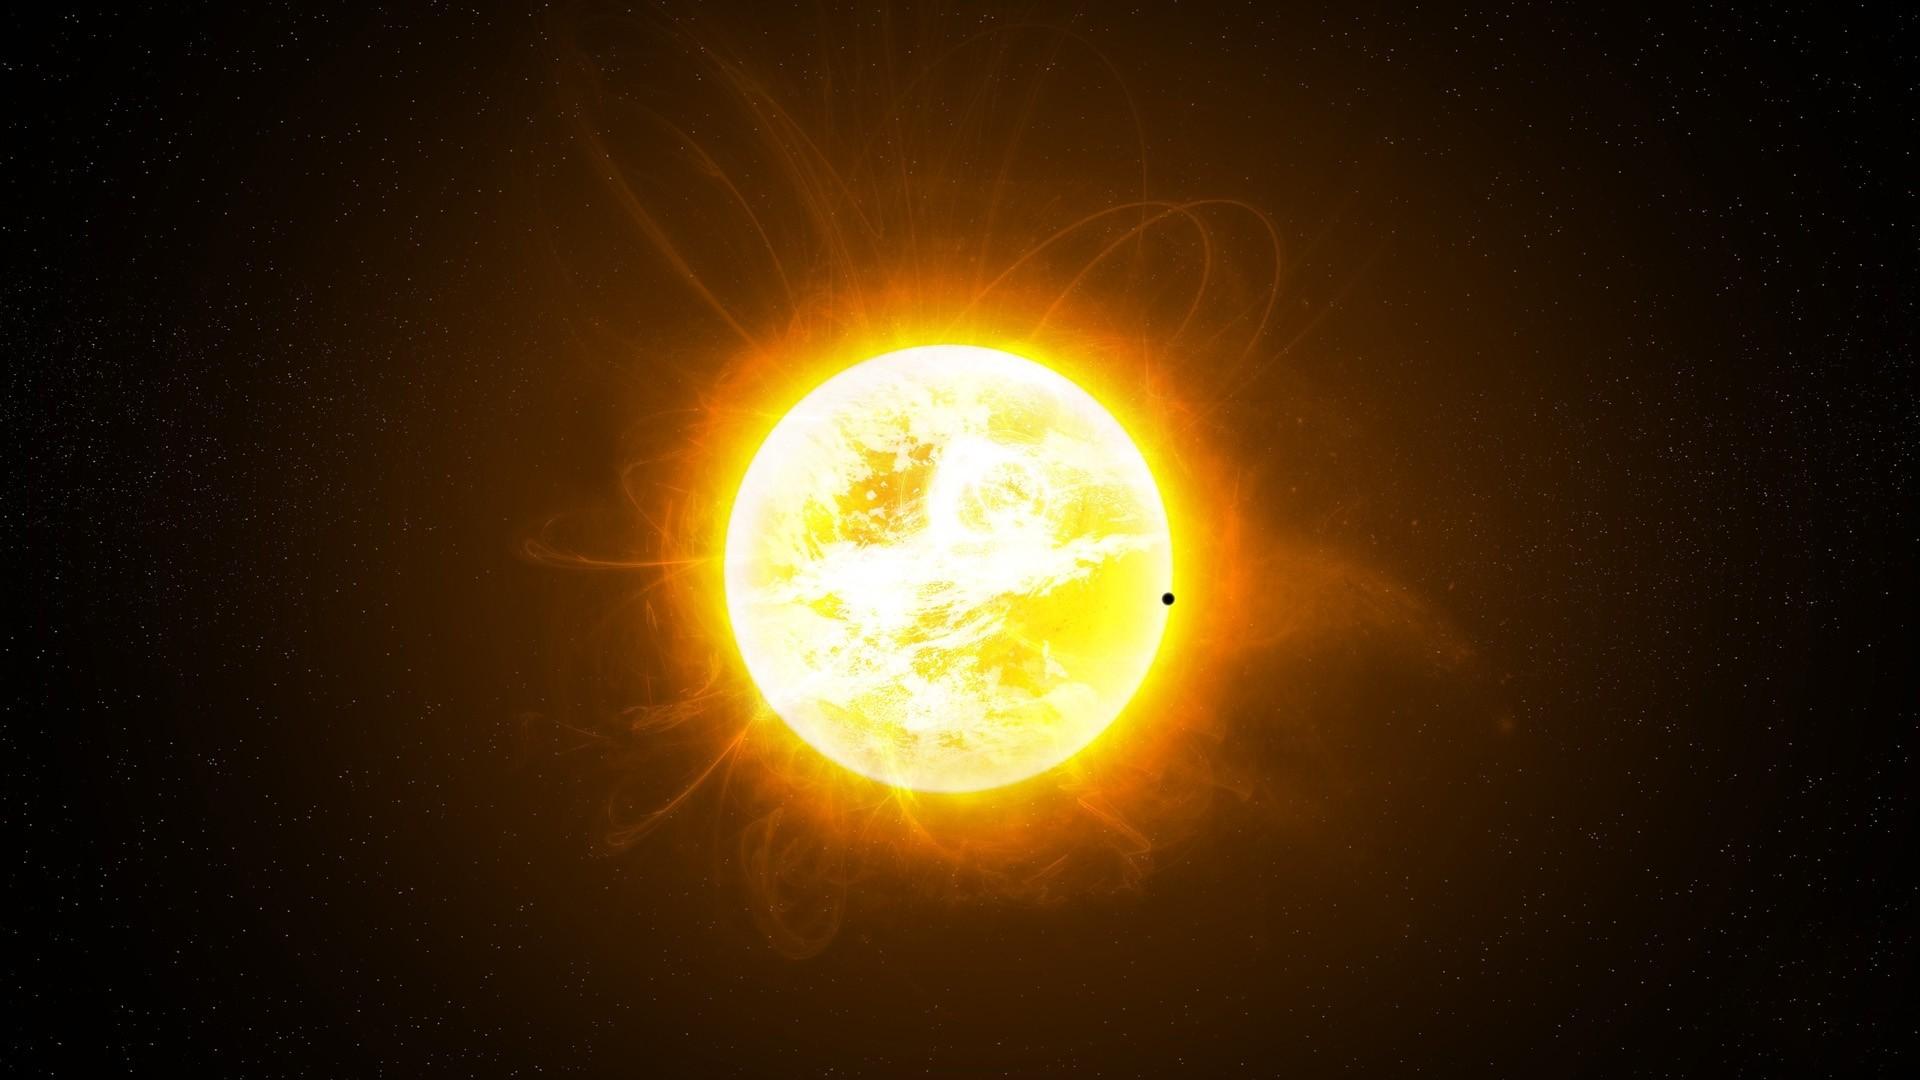 Sun hd wallpaper download